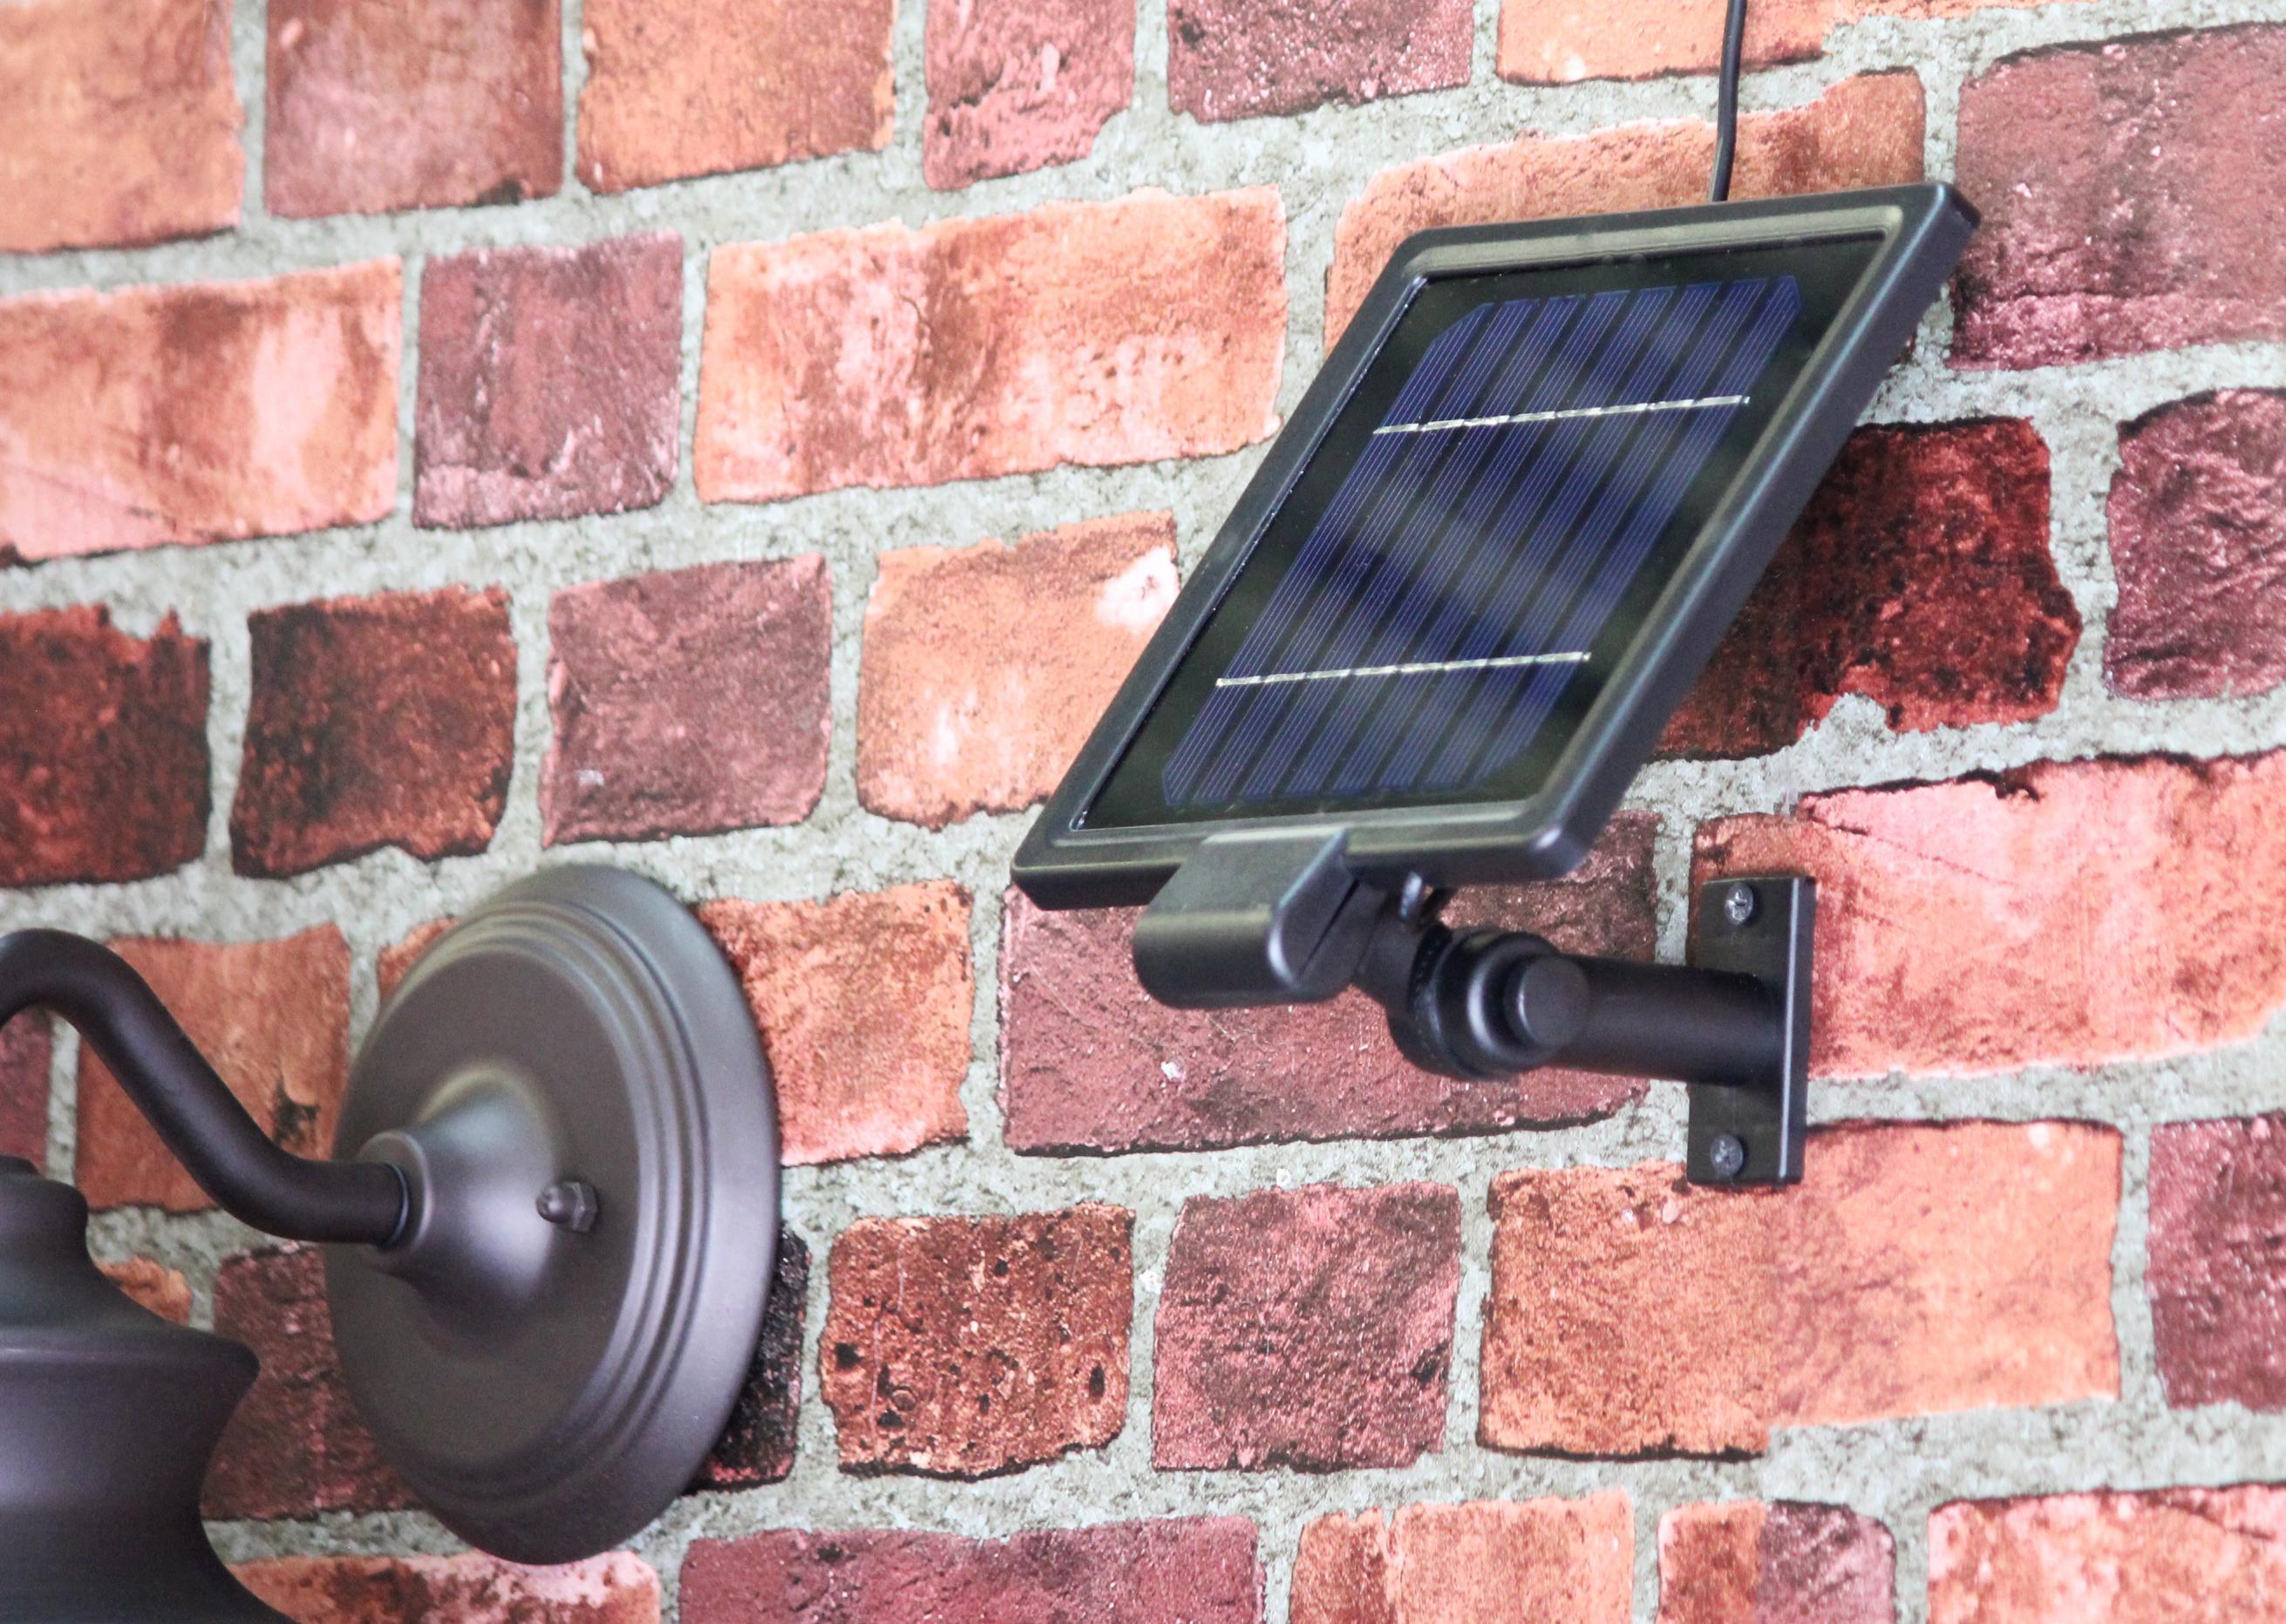 Solar Panel For Gama Sonic Gs 122 Barn Outdoor Solar Light